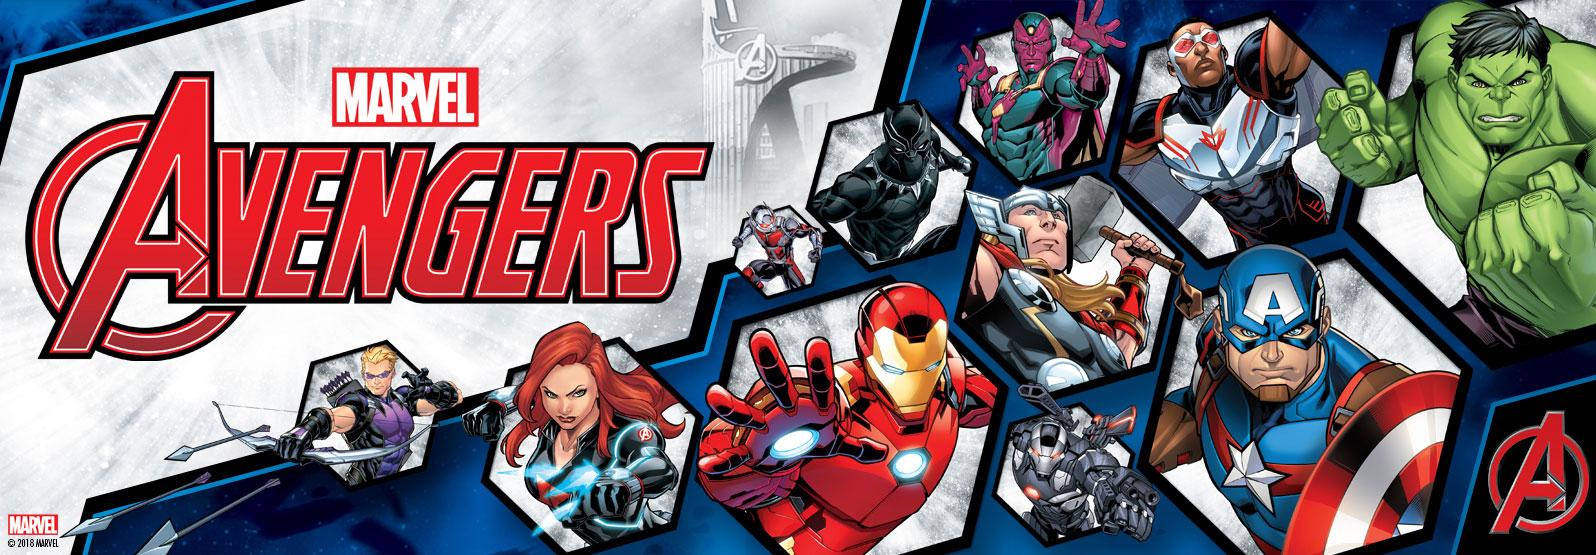 Oprawki Avengers